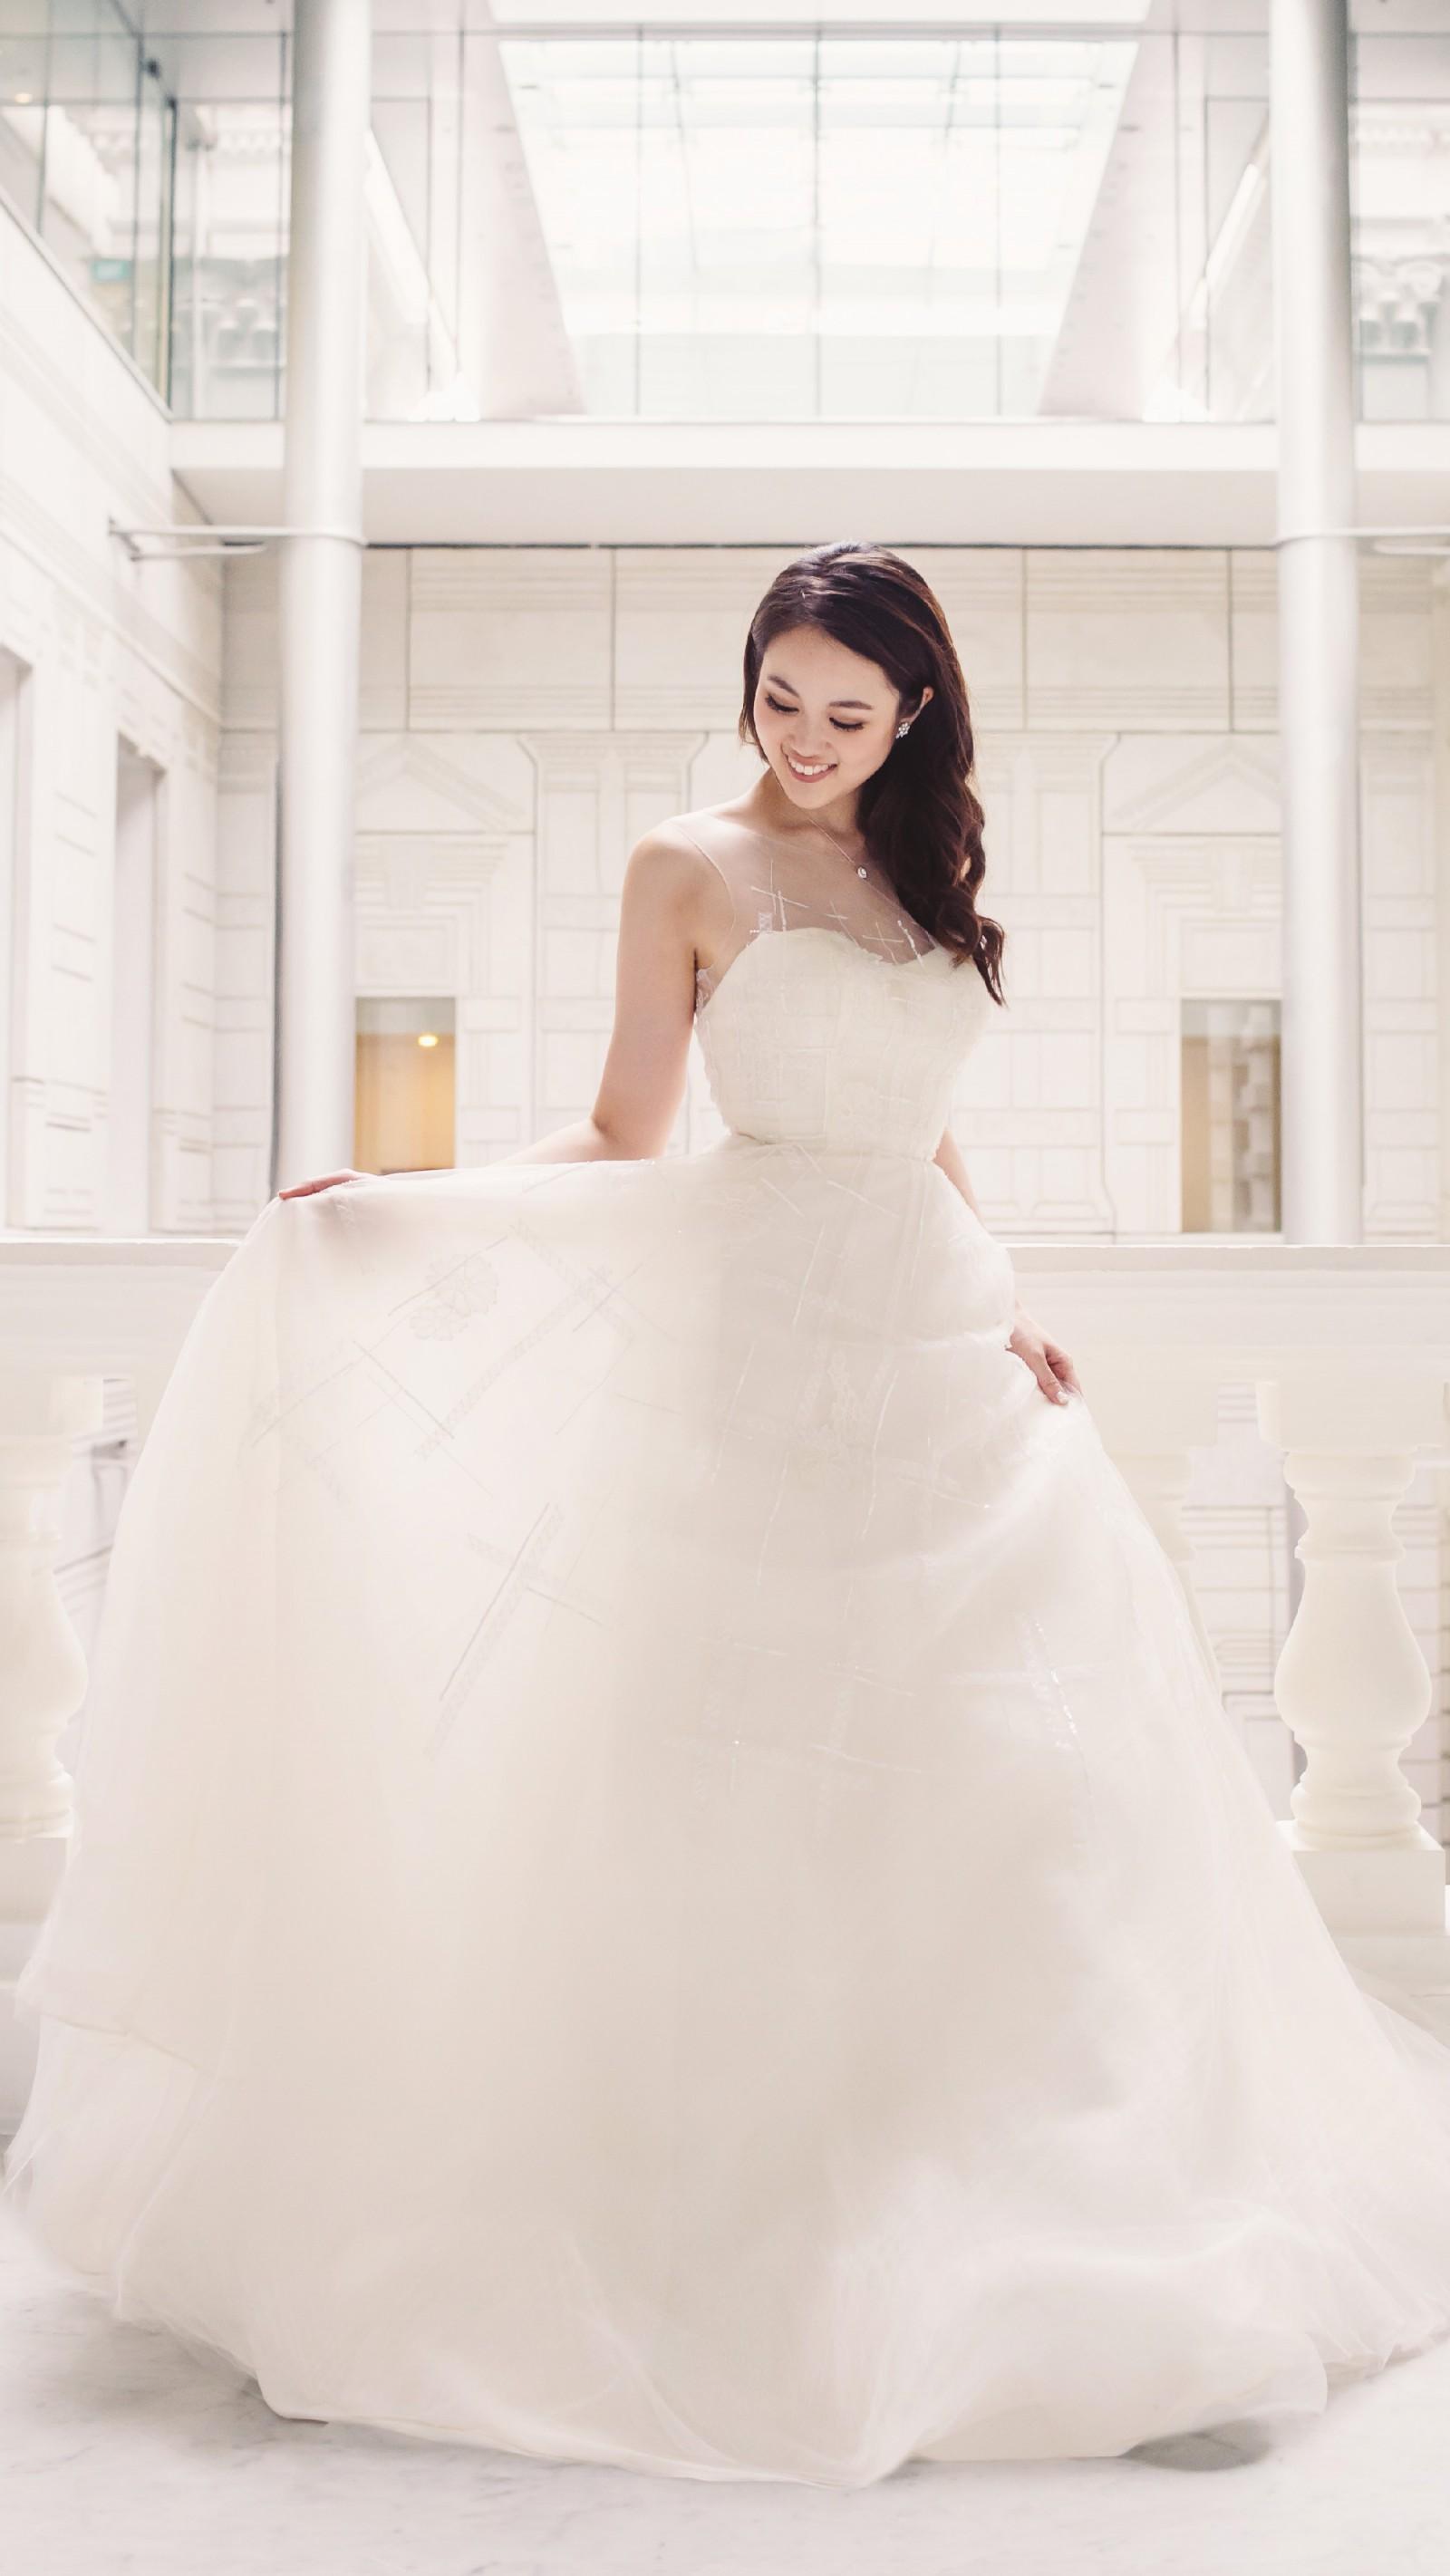 Y7r2vtutuktrvm,Wedding Party Dresses Plus Size